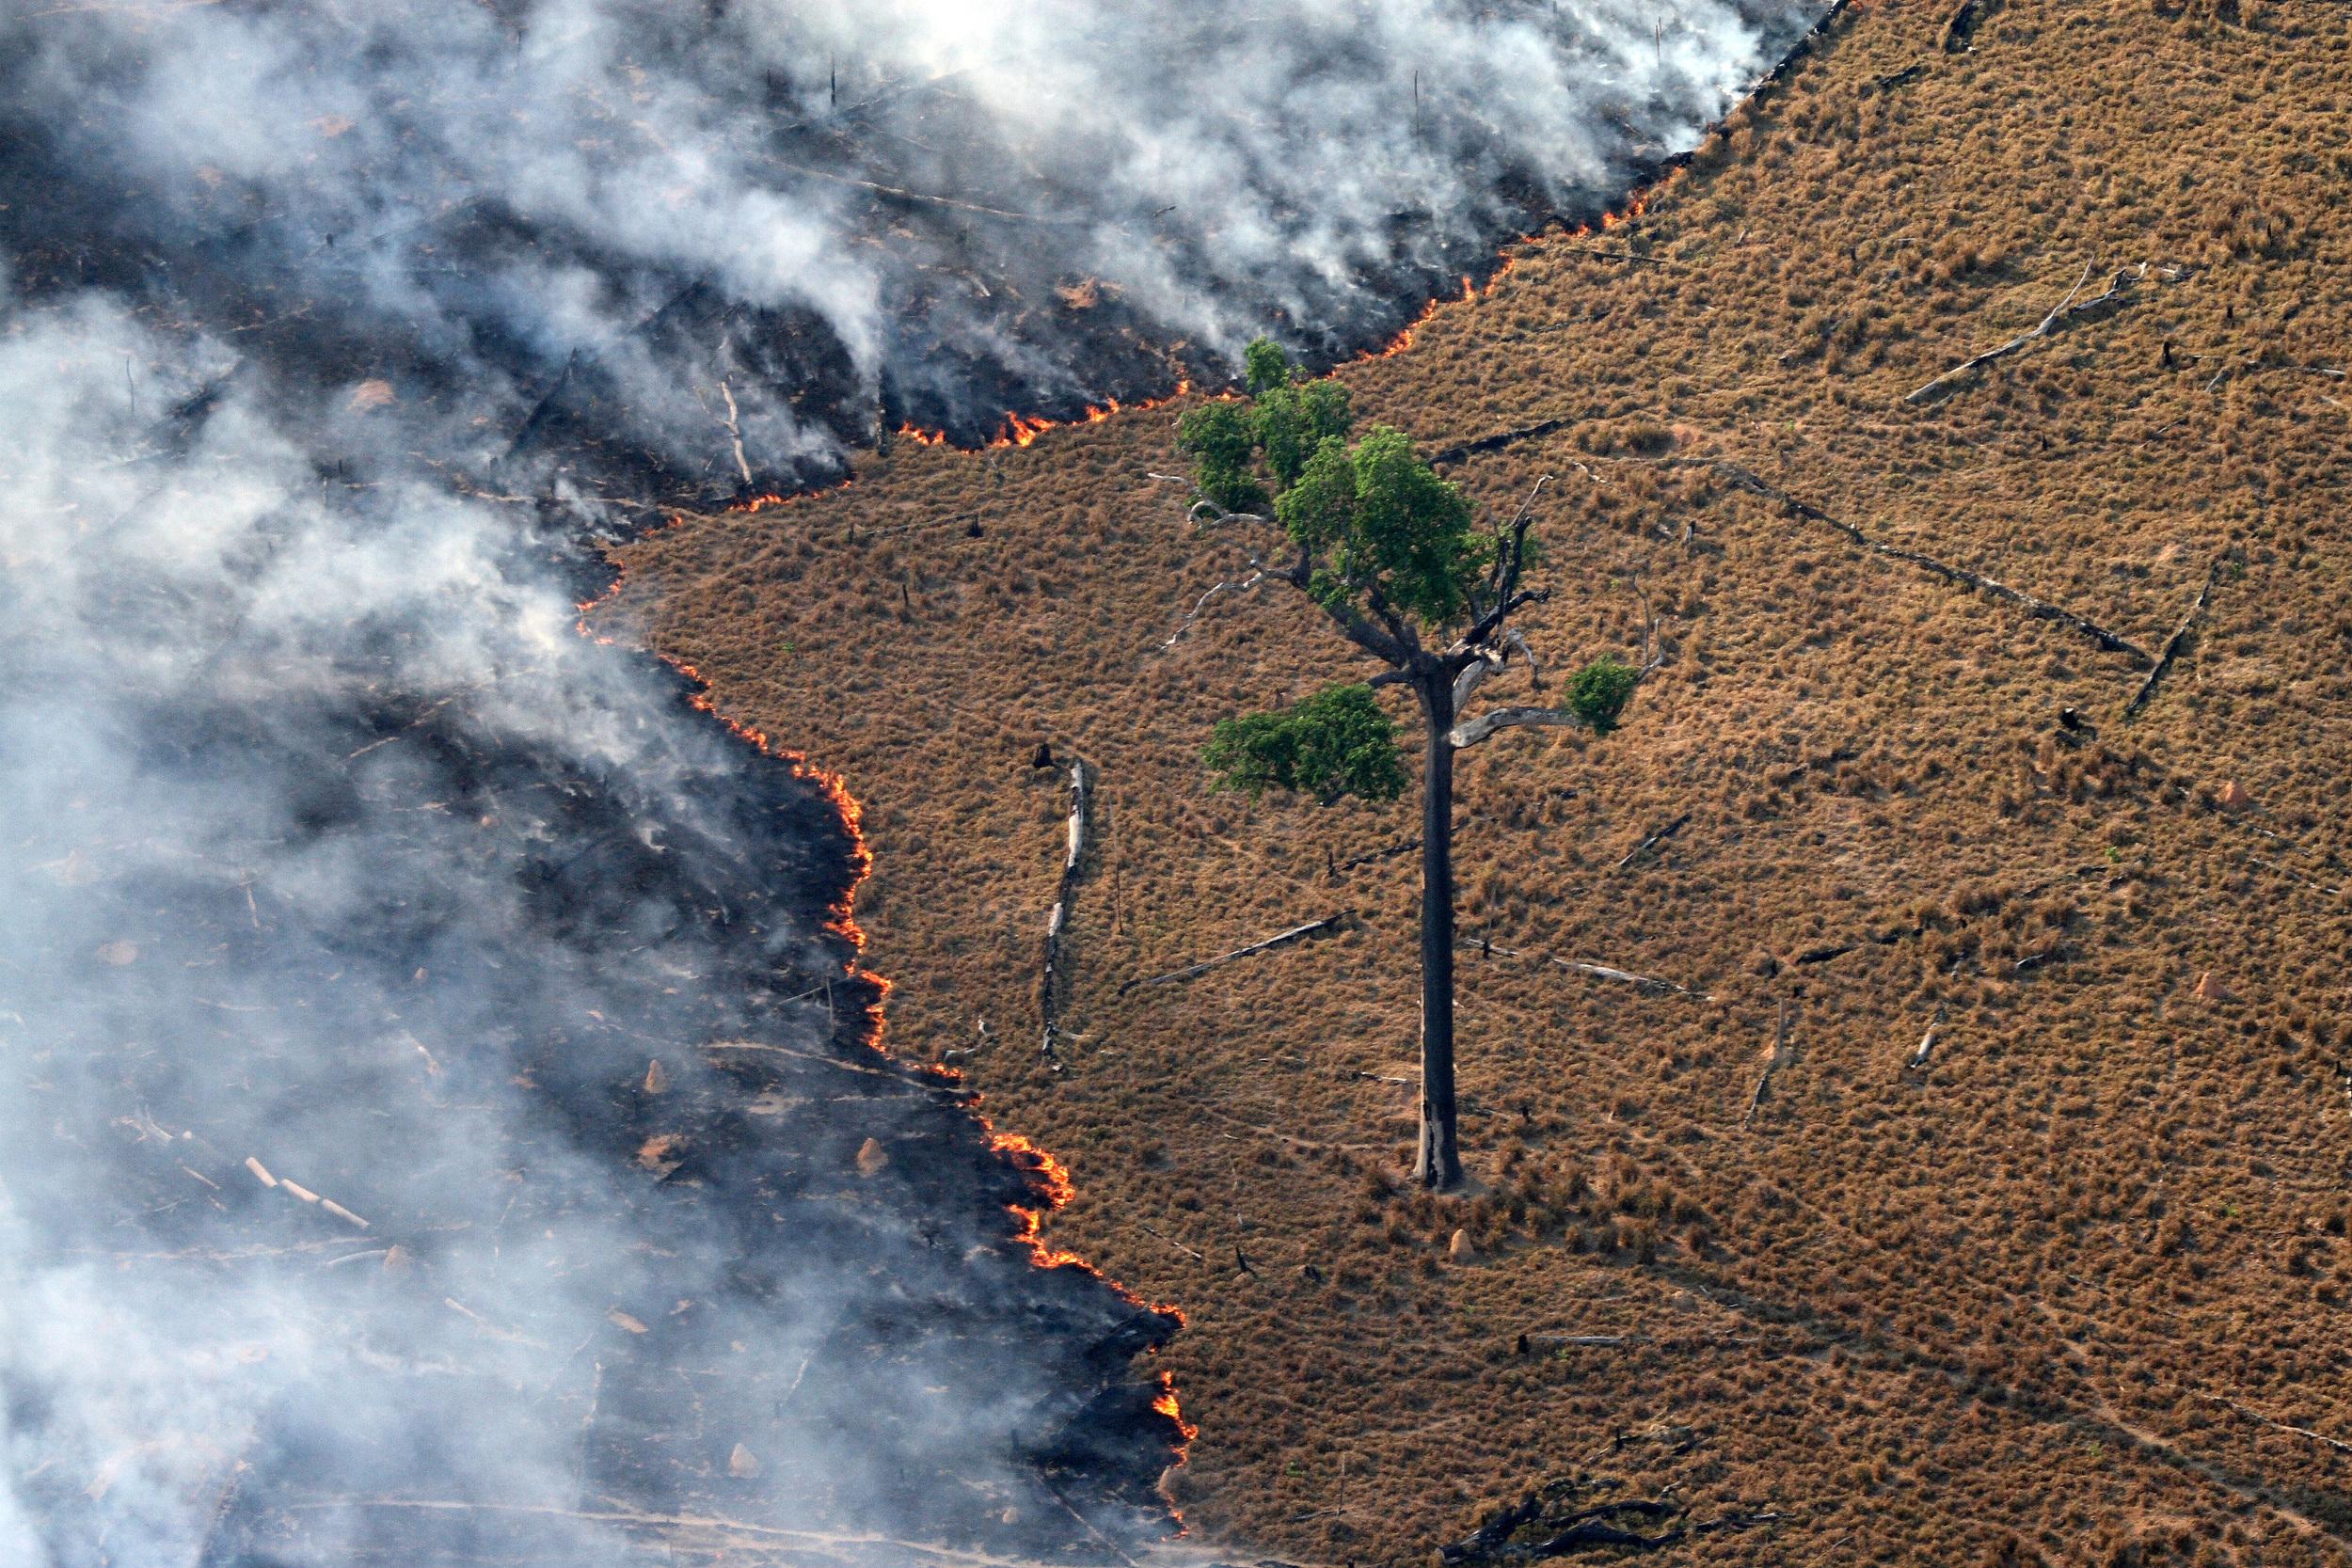 burning pasture in Amazon